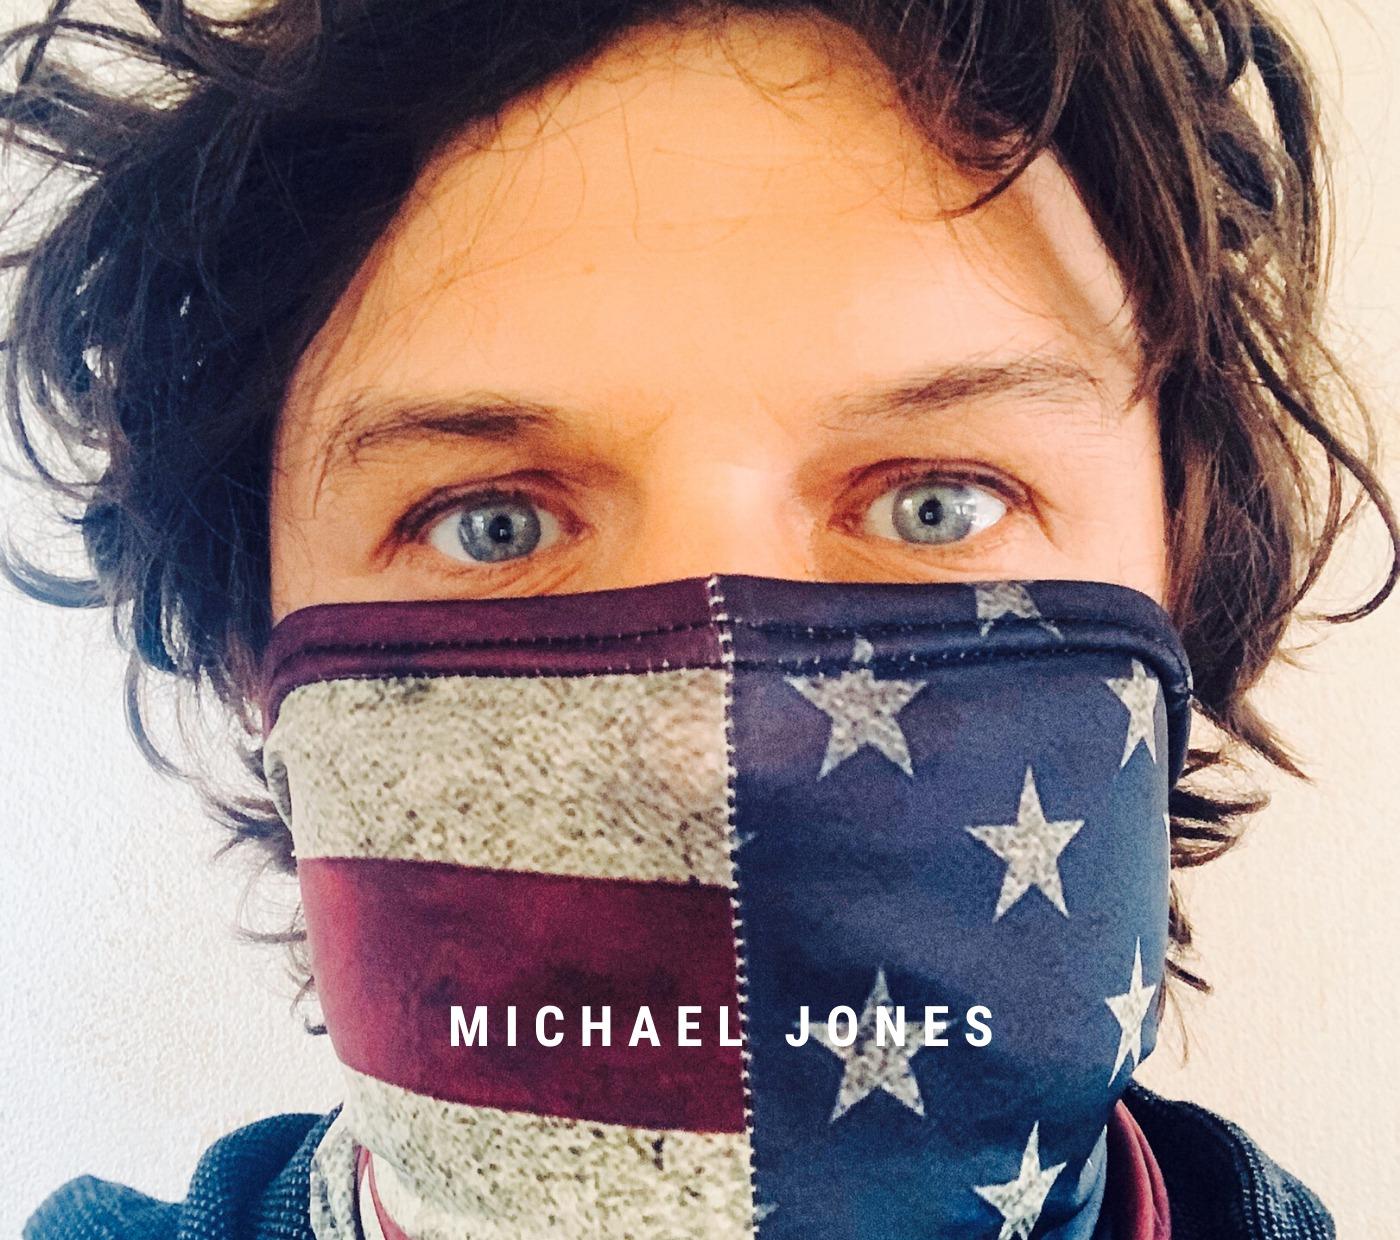 TRACK PREMIERE:  Michael Jones - We Are Soldiers